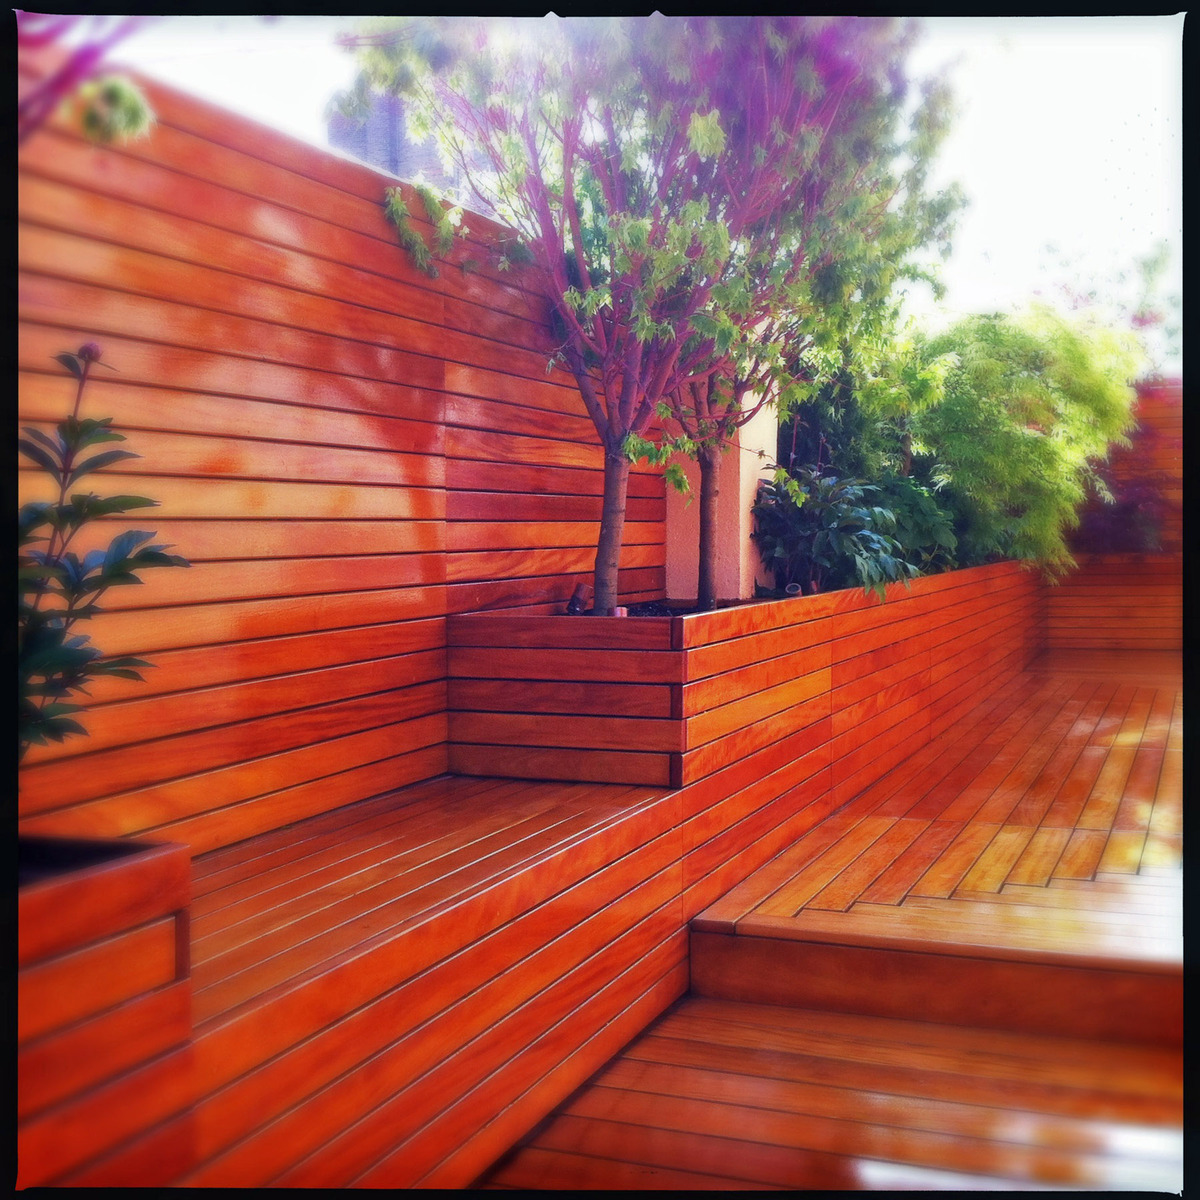 Nyc Garden Design 4 top tips about rooftop garden in nyc Nyc Garden Design Rooftop Zen Garden For Yoga Studio